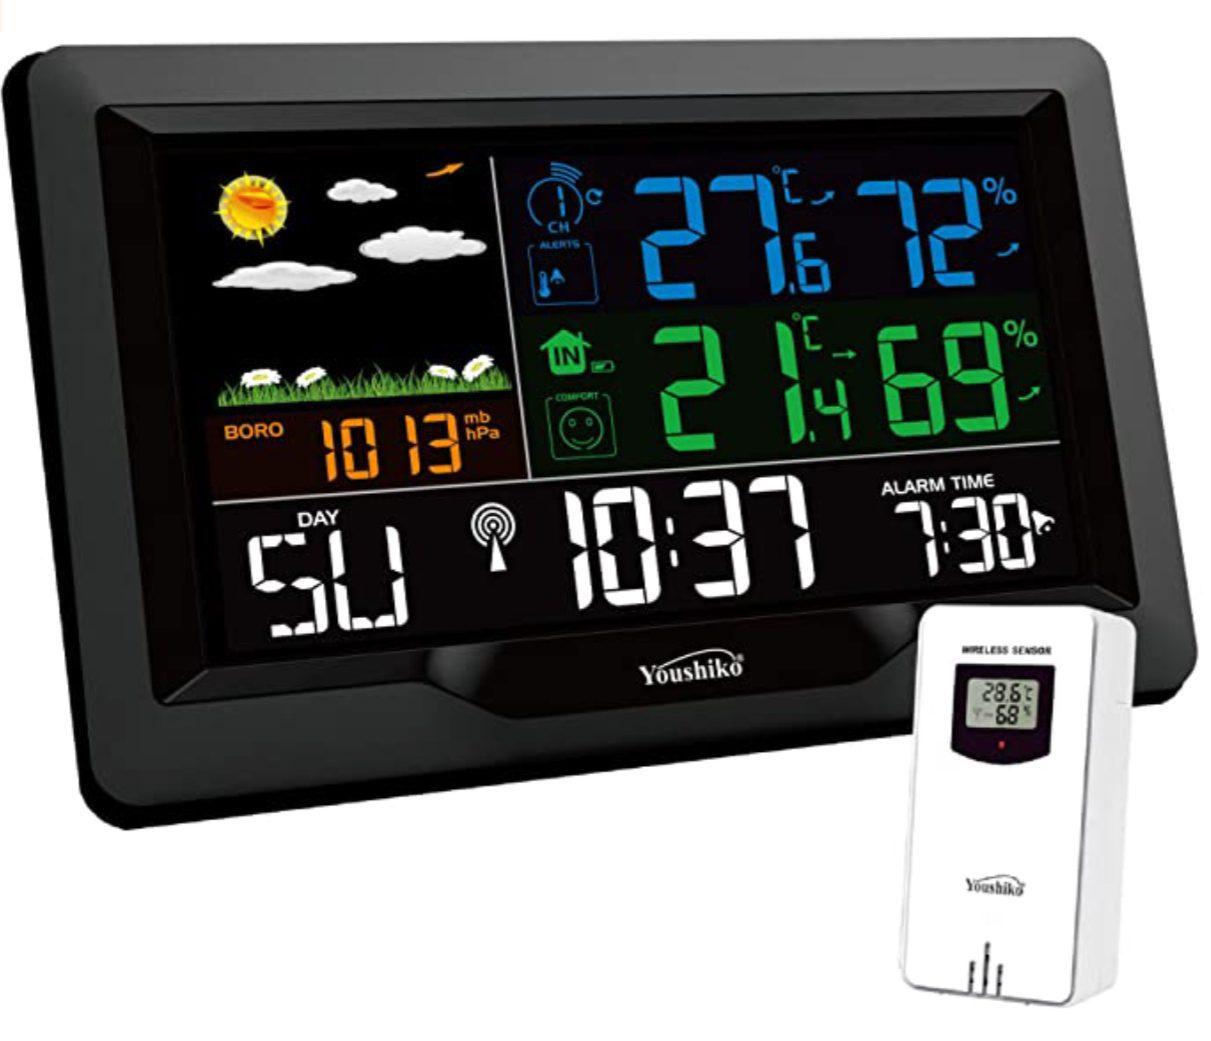 Youshiko YC9442 Wireless Weather Station